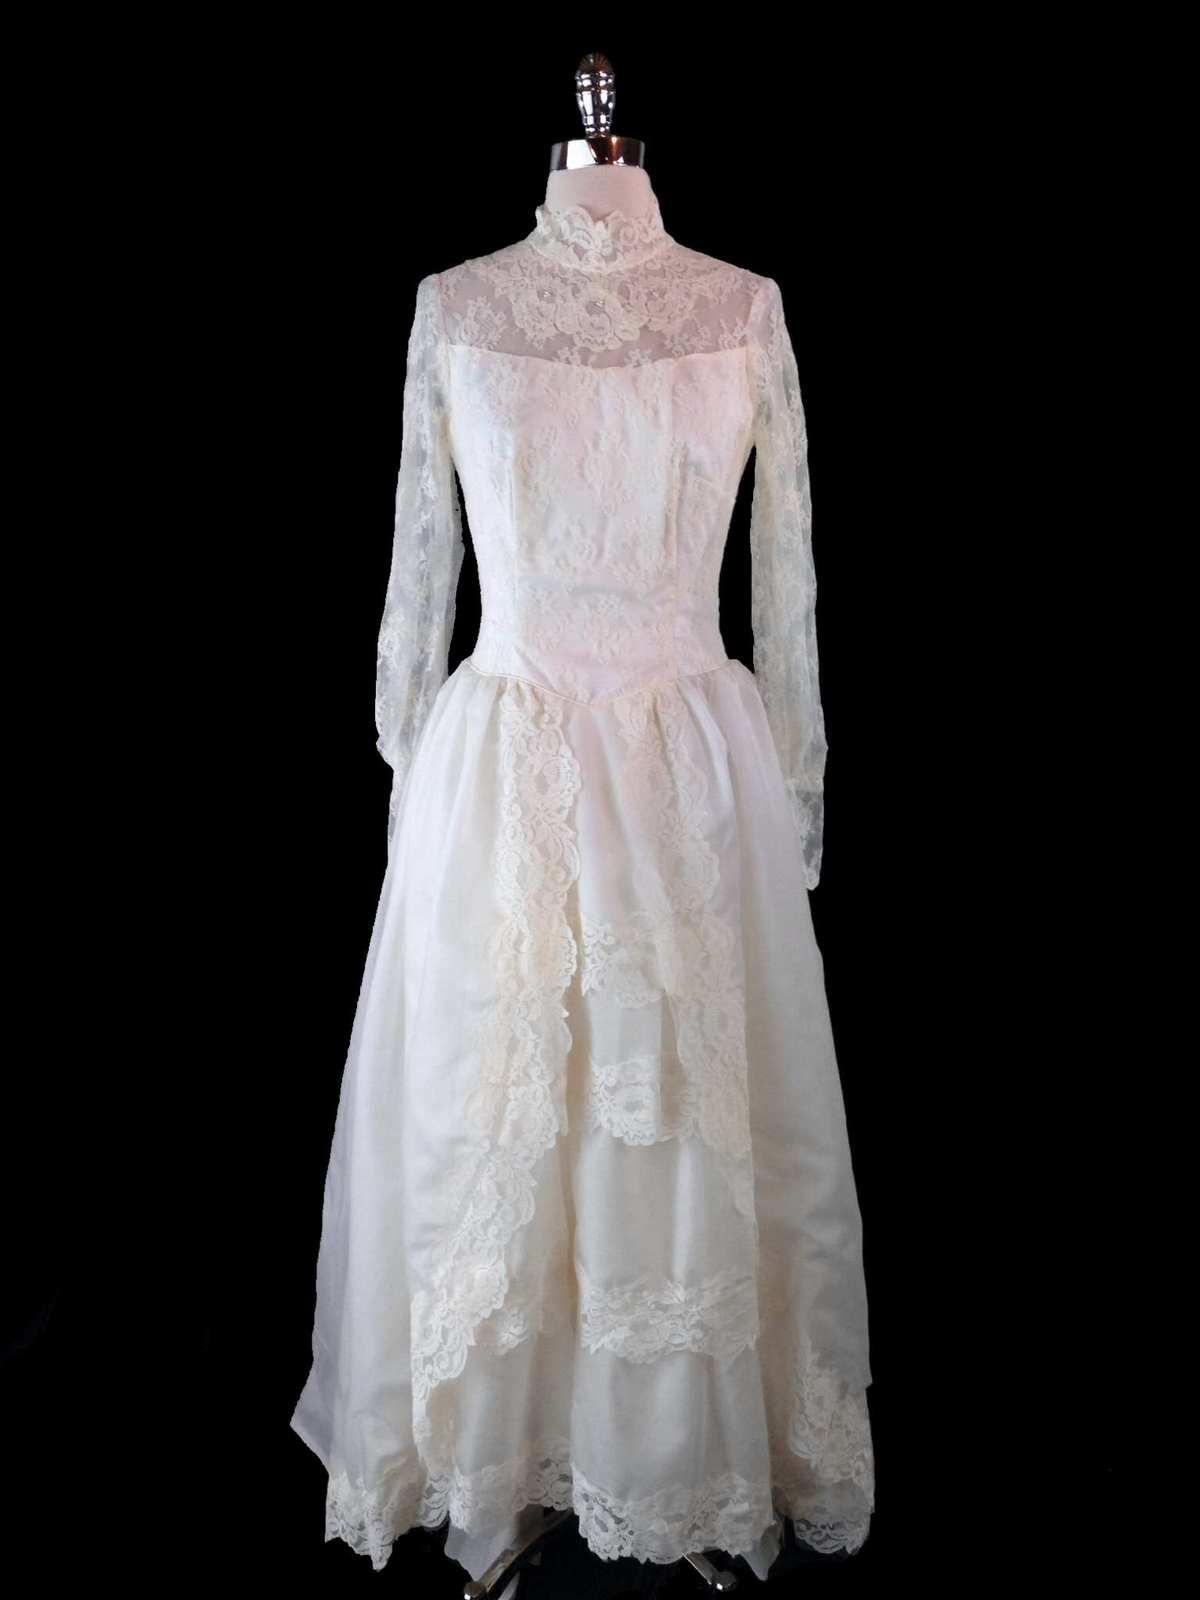 Vtg 60s Wedding Dress Xs Lace Chiffon Tiered Gown